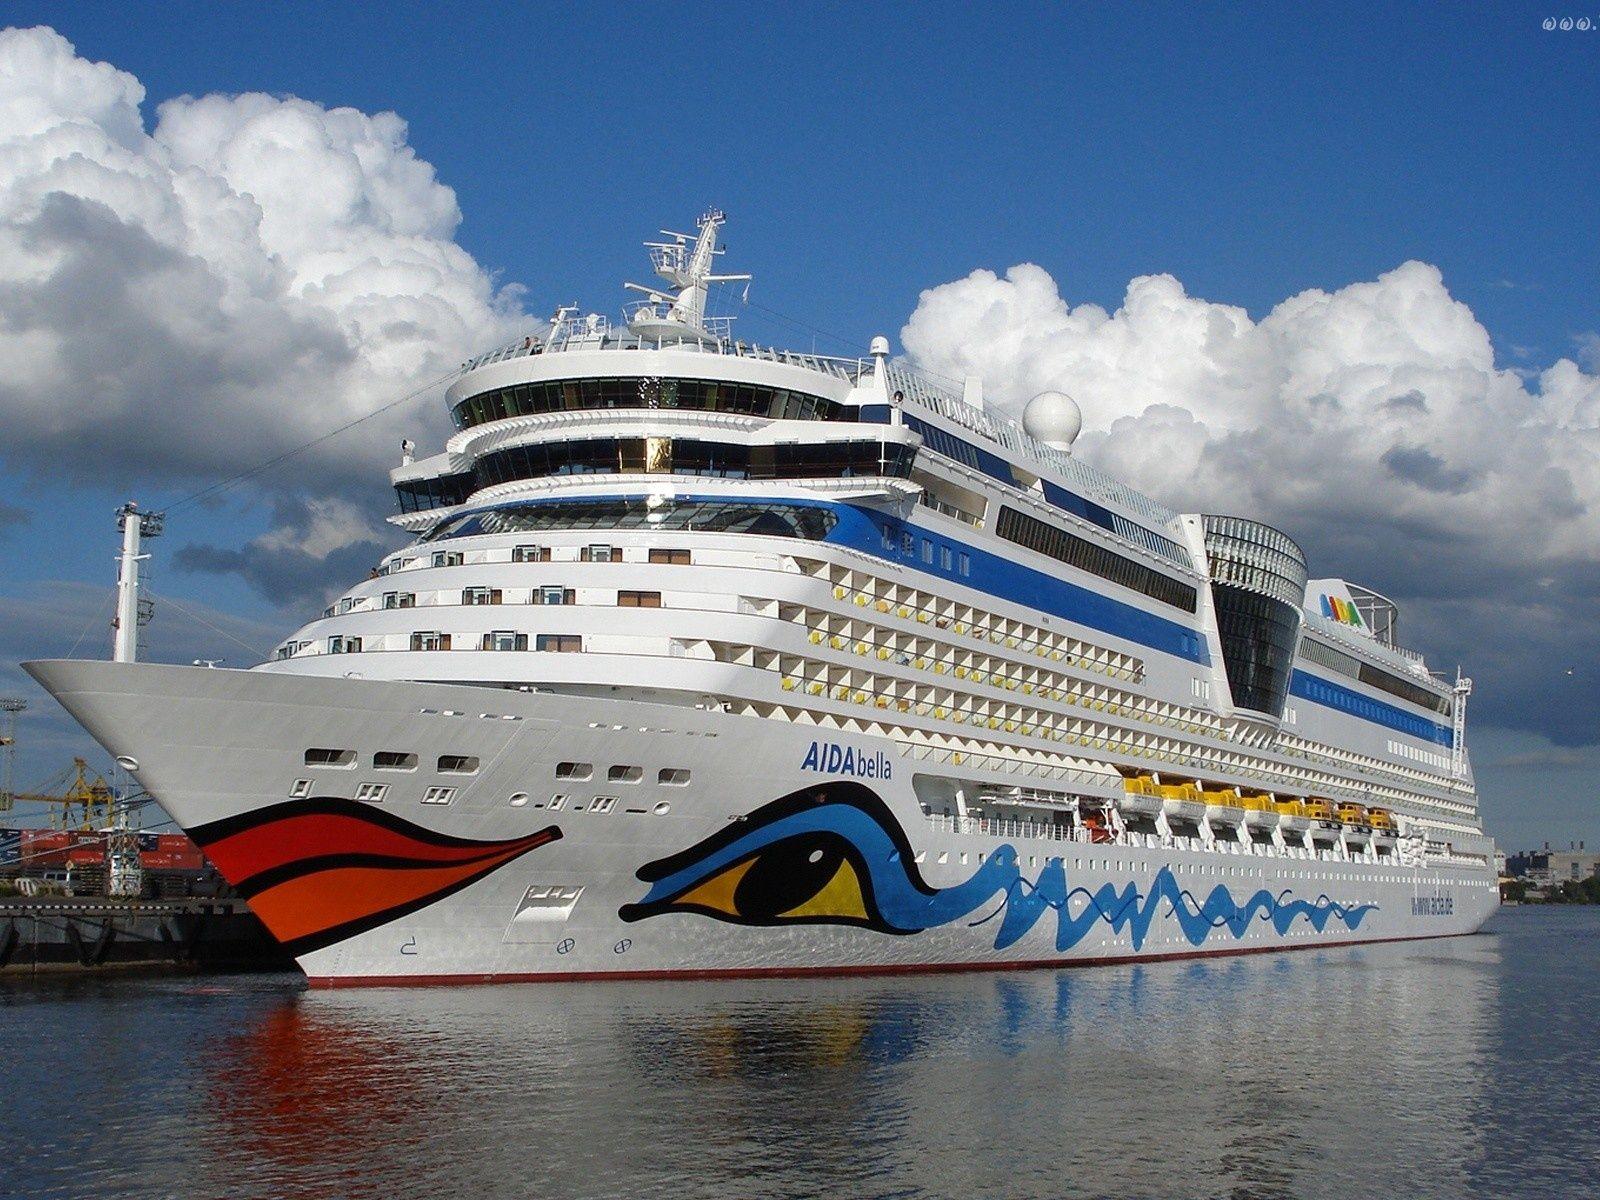 Aida Bella Ship Wallpaper In X Aida Cruise Ship Liner - Columbo cruise ship